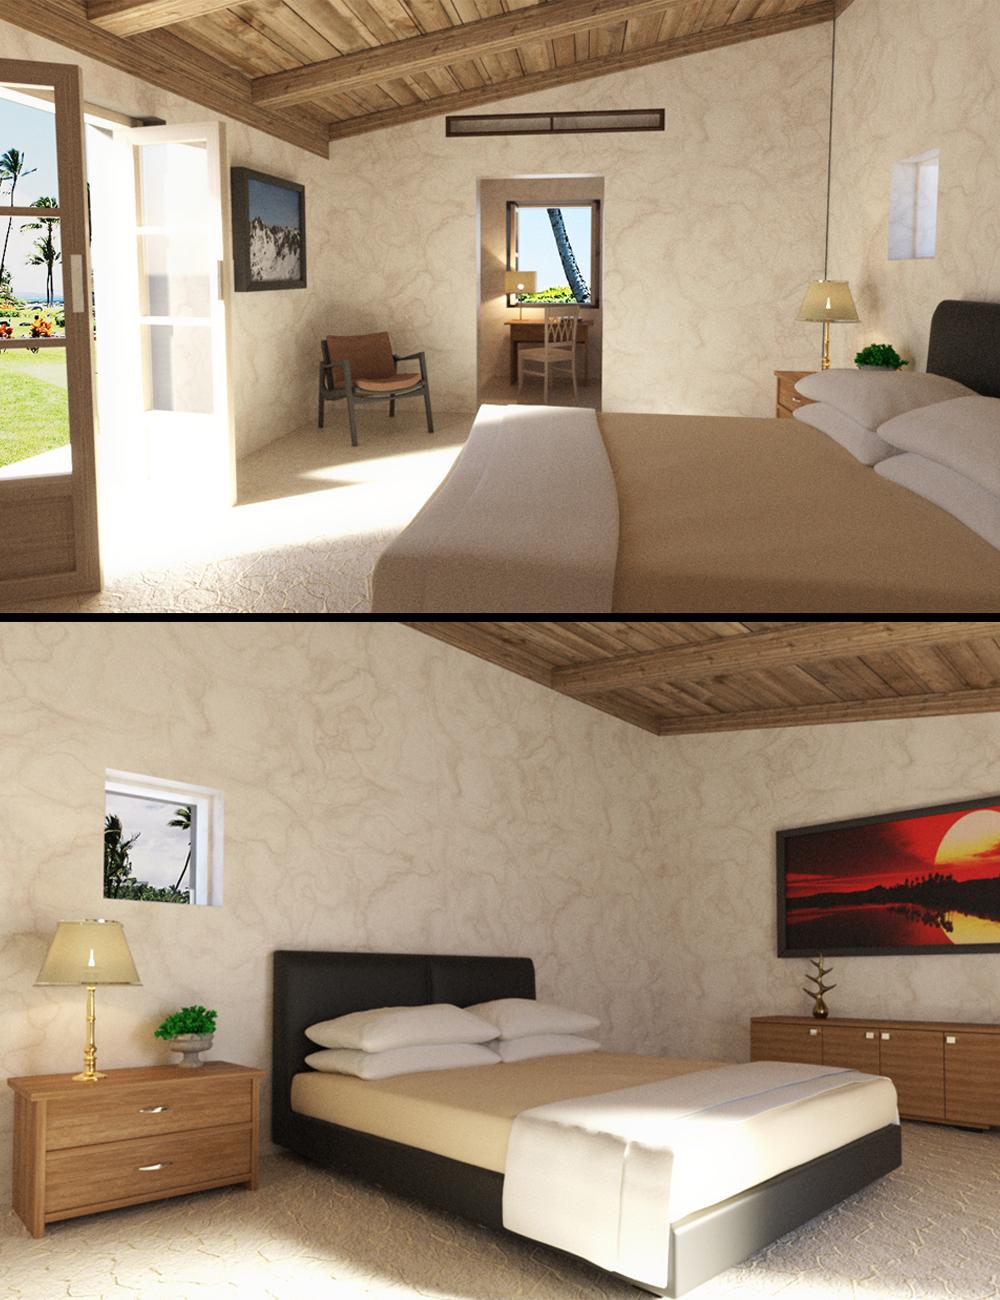 Island Room by: Tesla3dCorp, 3D Models by Daz 3D